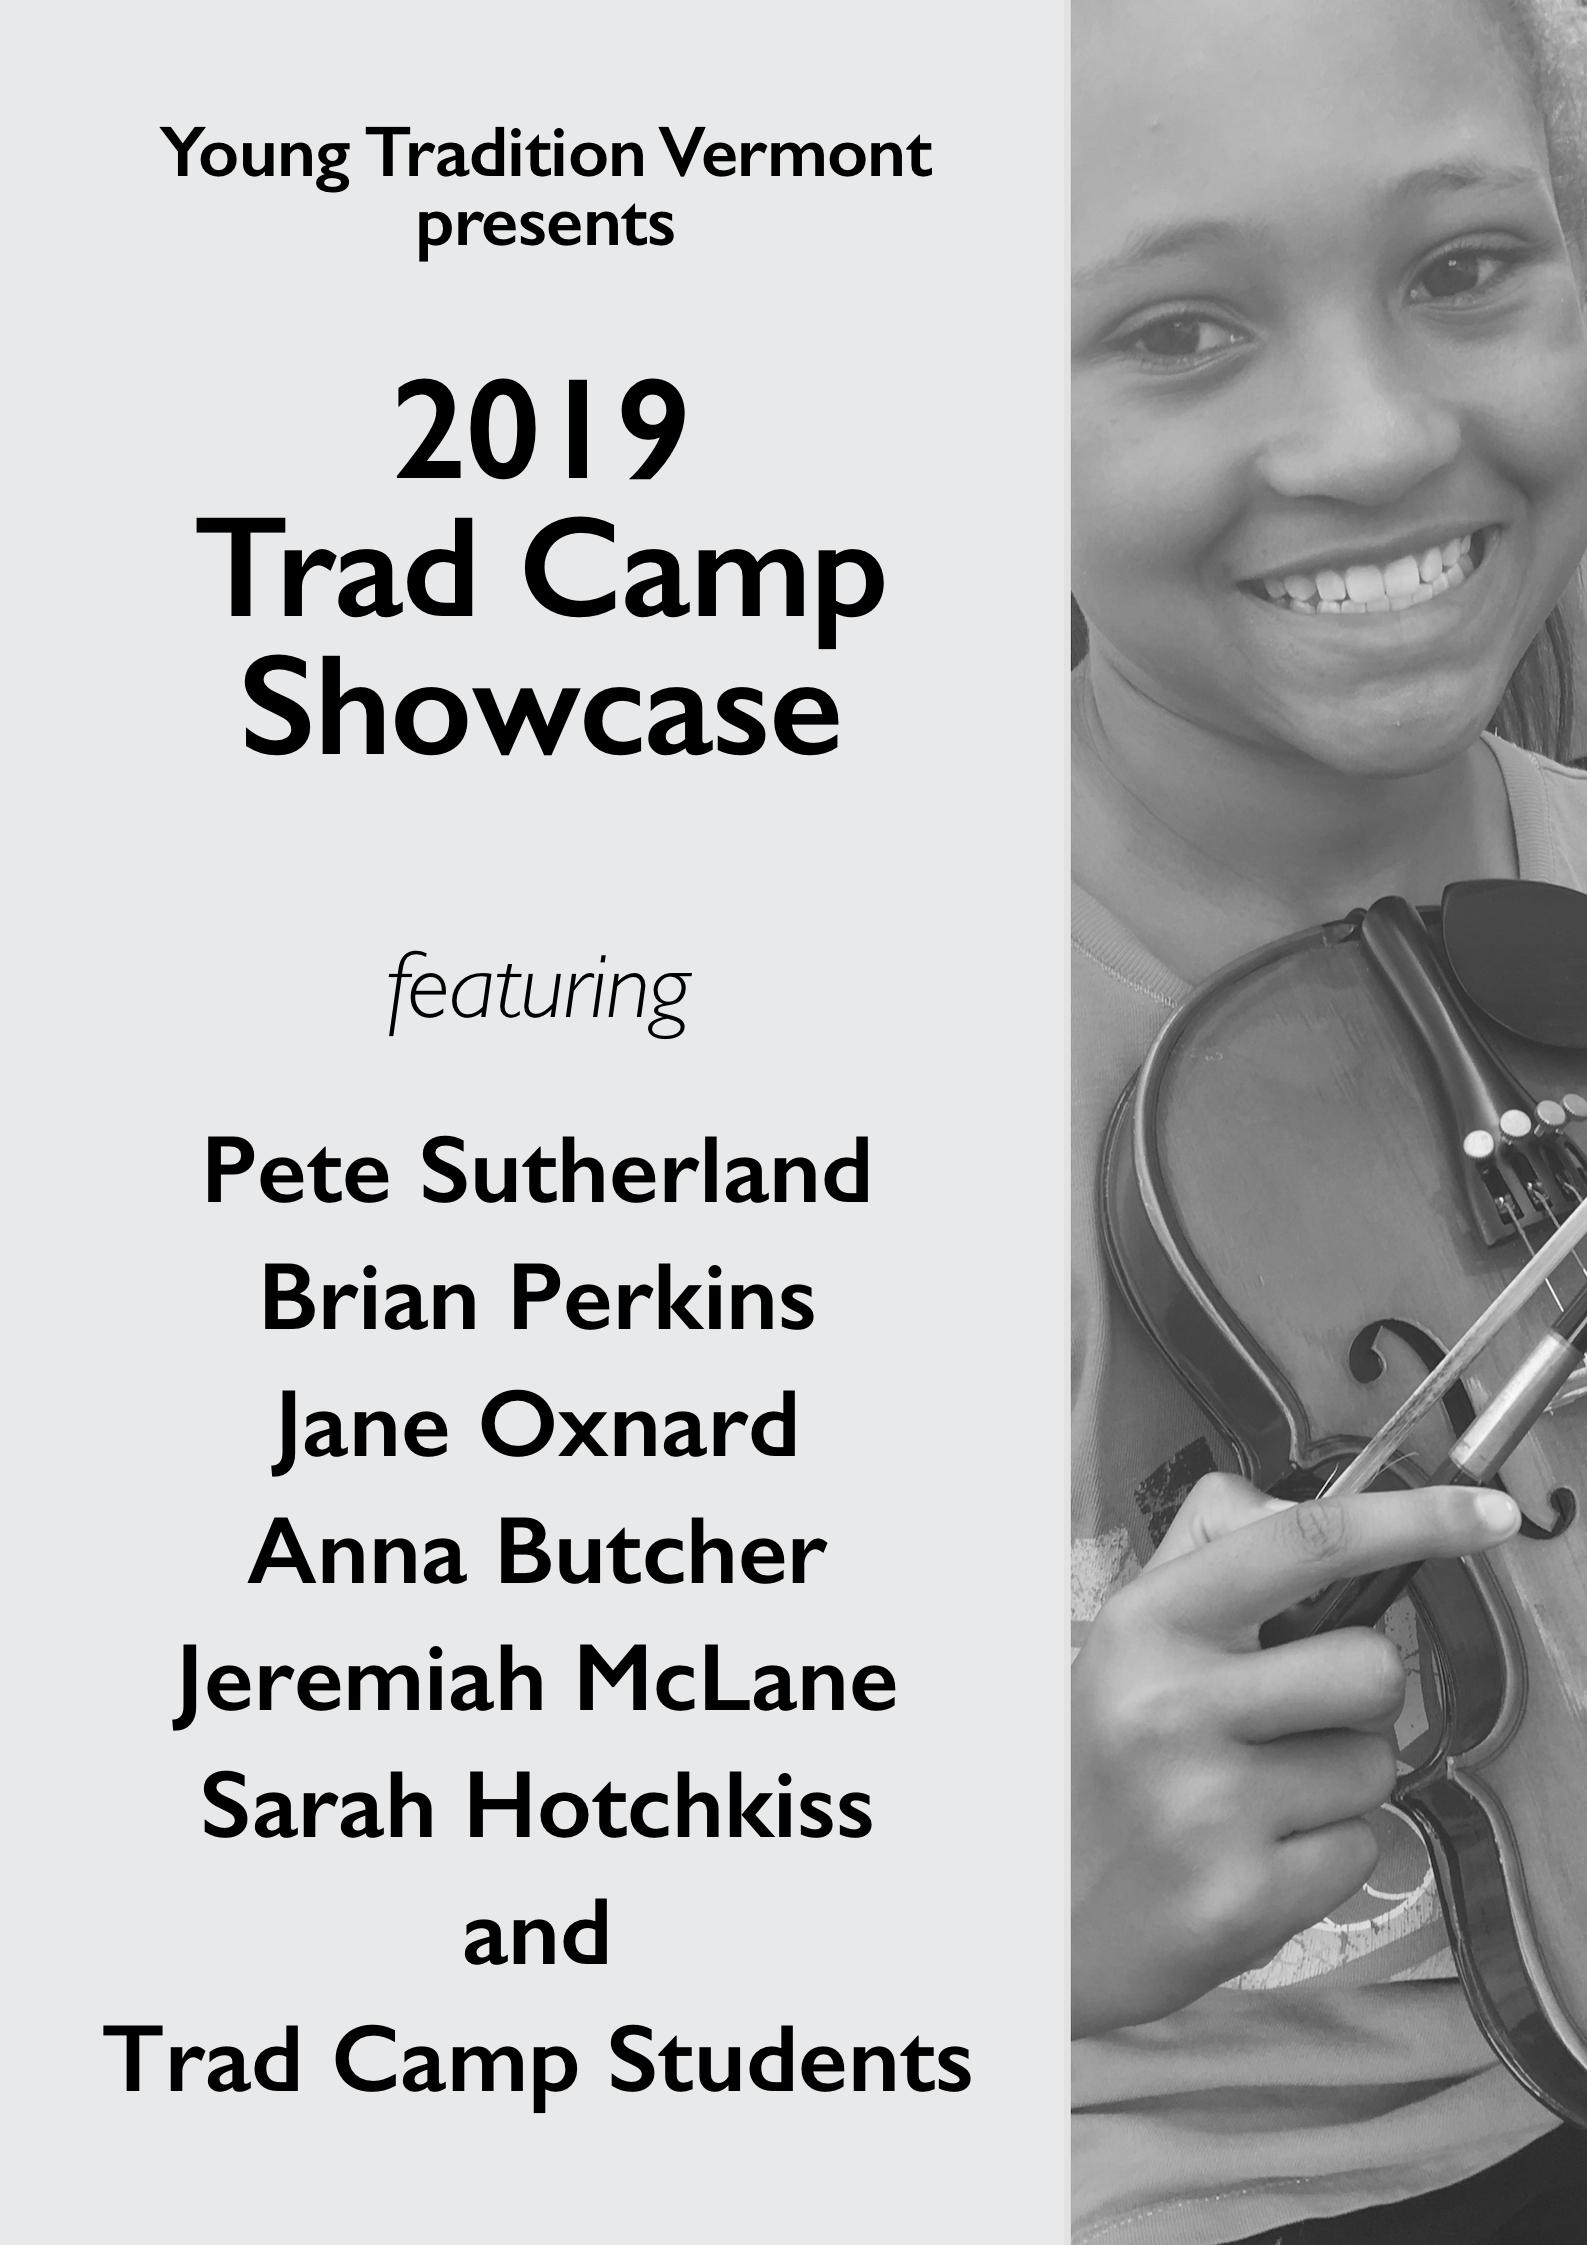 Trad-Campshowcase2019.jpg